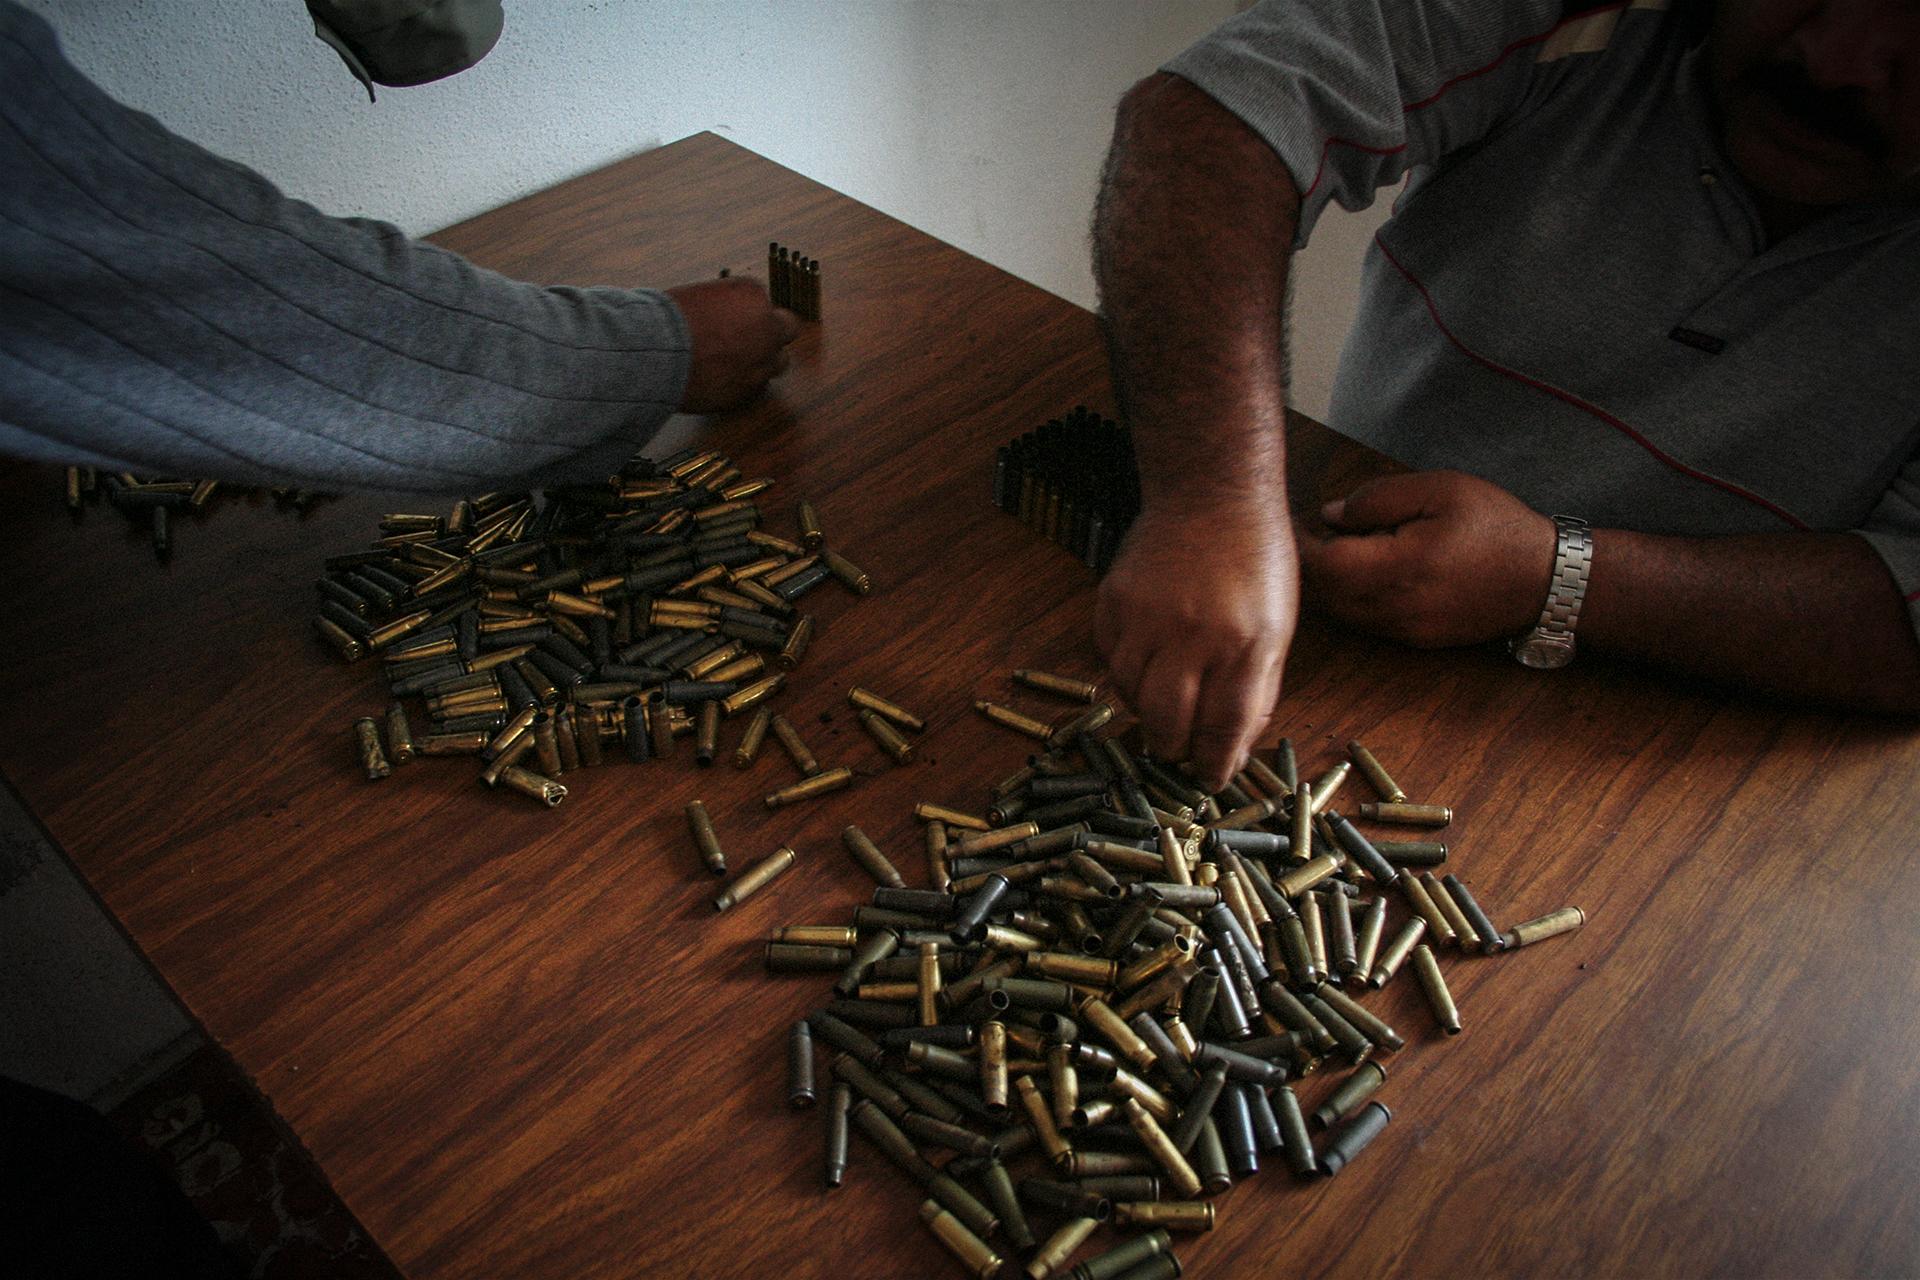 A police official sorts bullets after a drug murder.